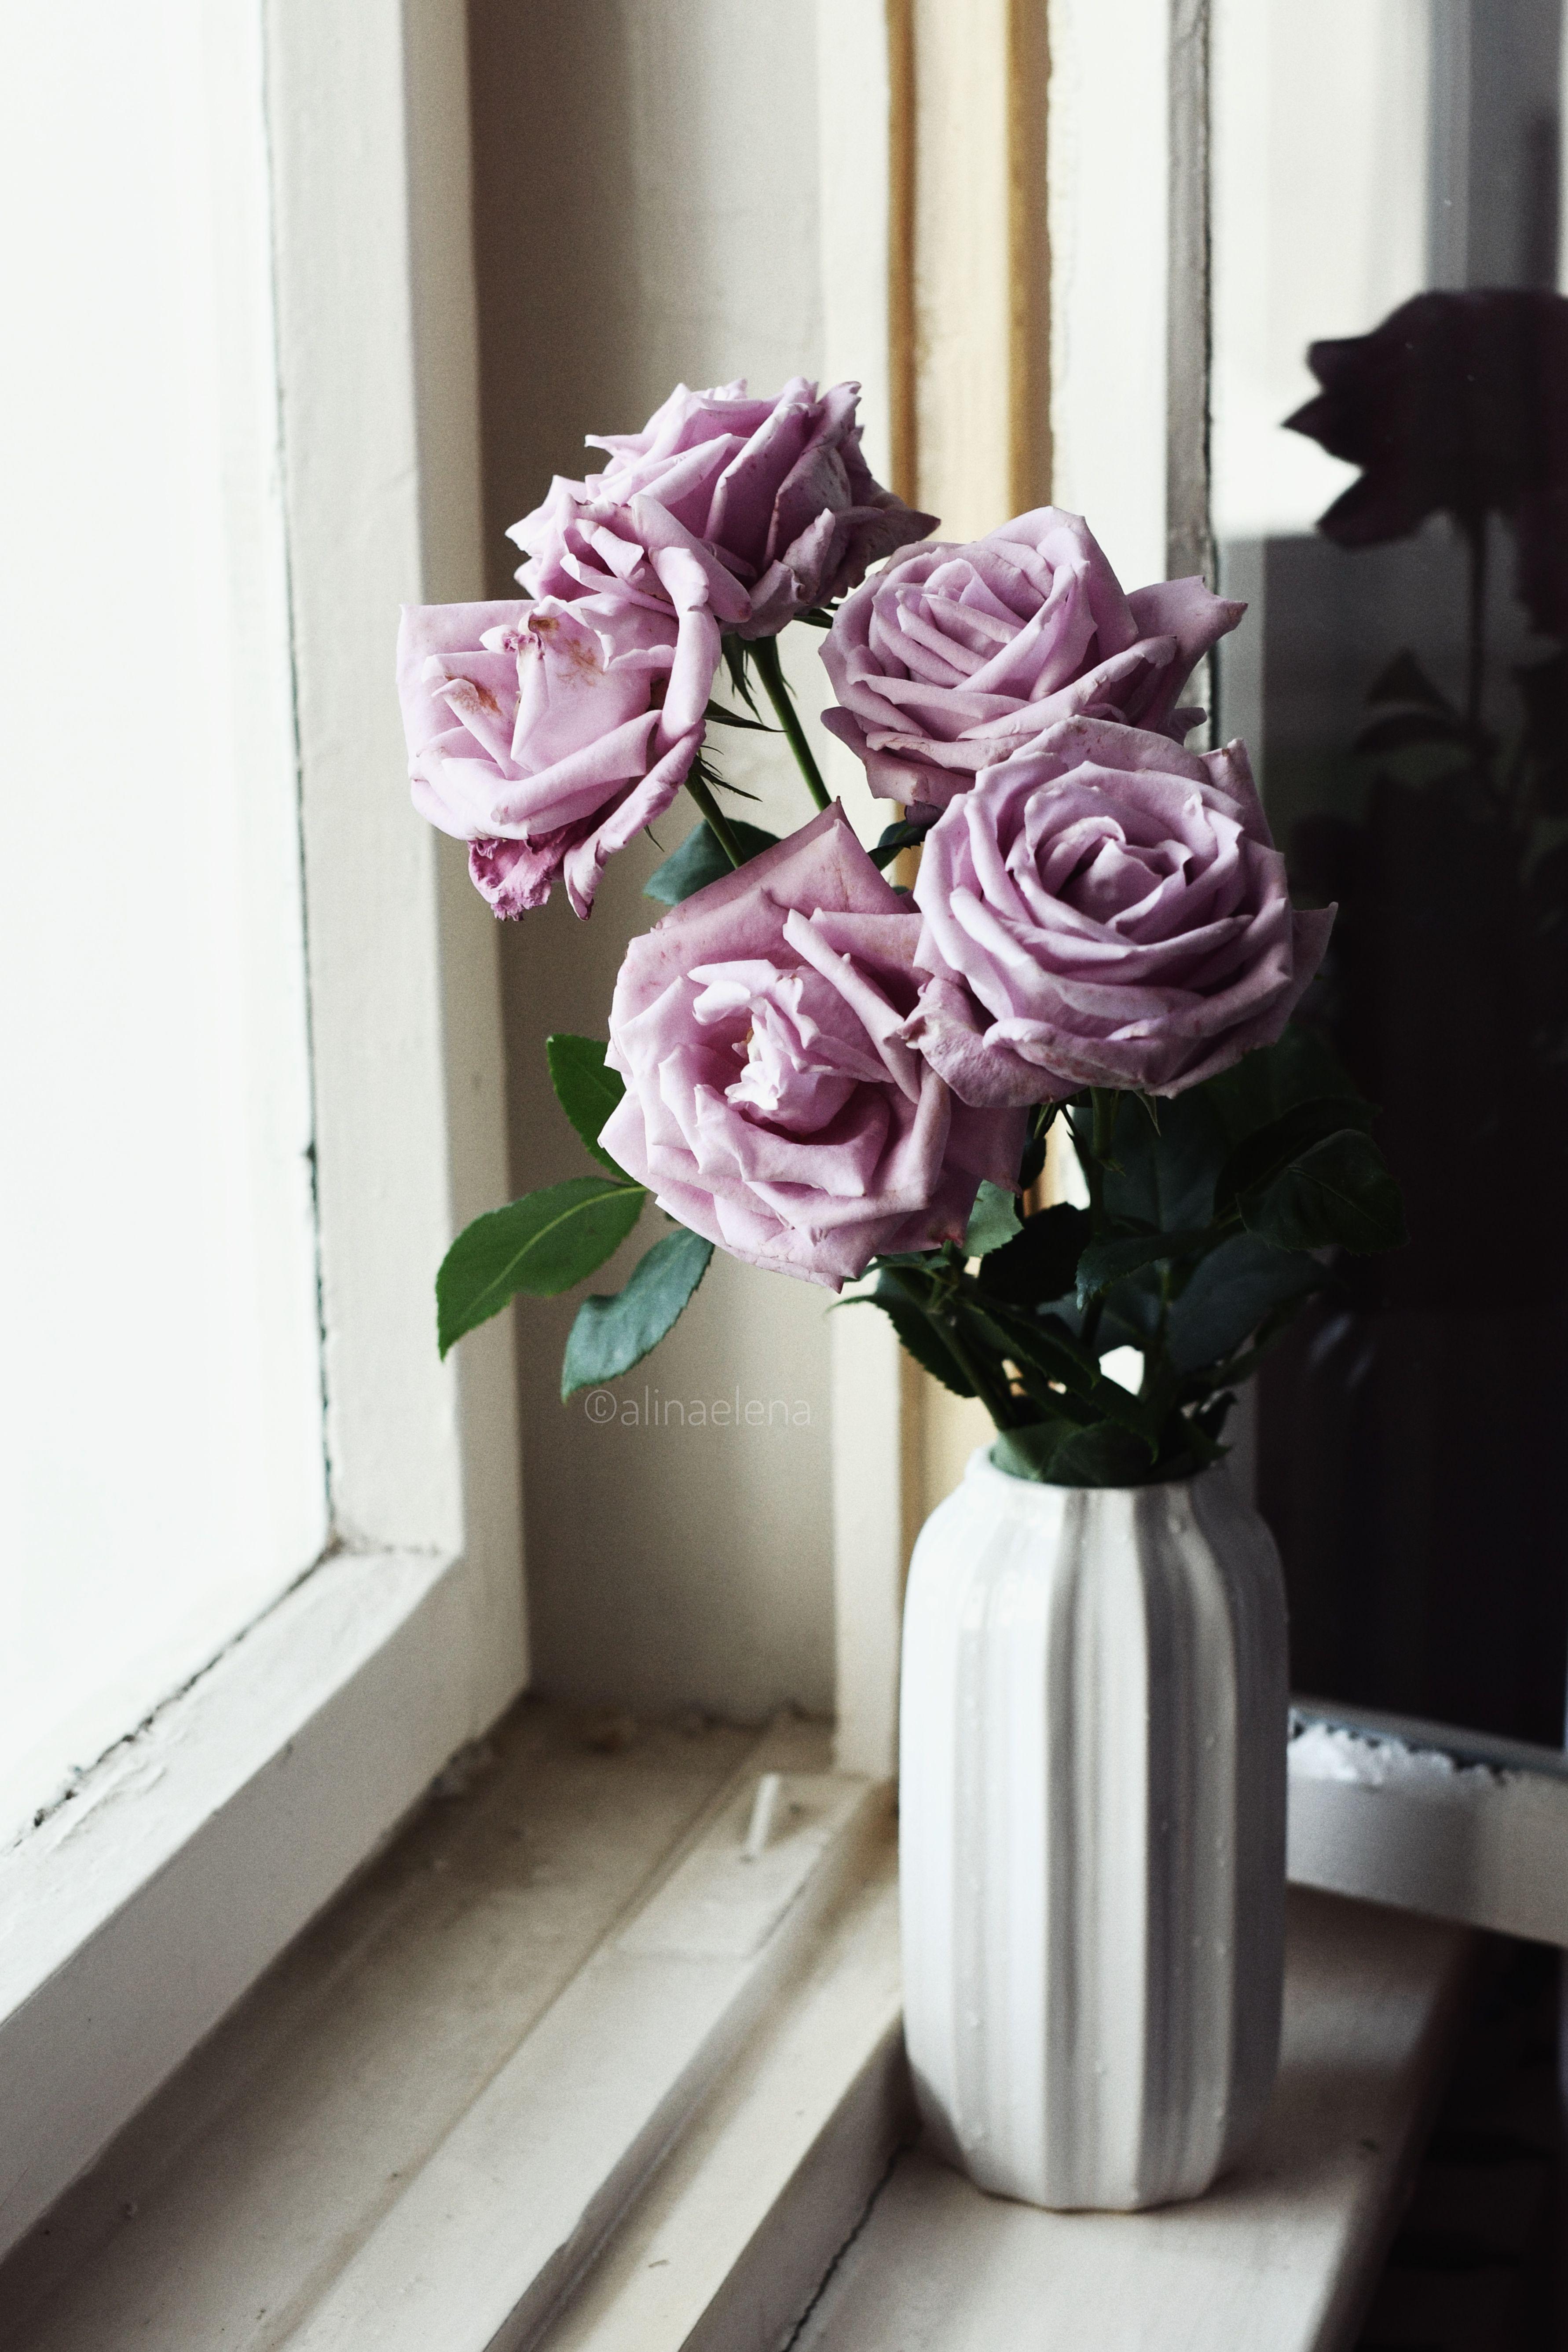 #roses #flowers #purple #purpleroses #flowerlover